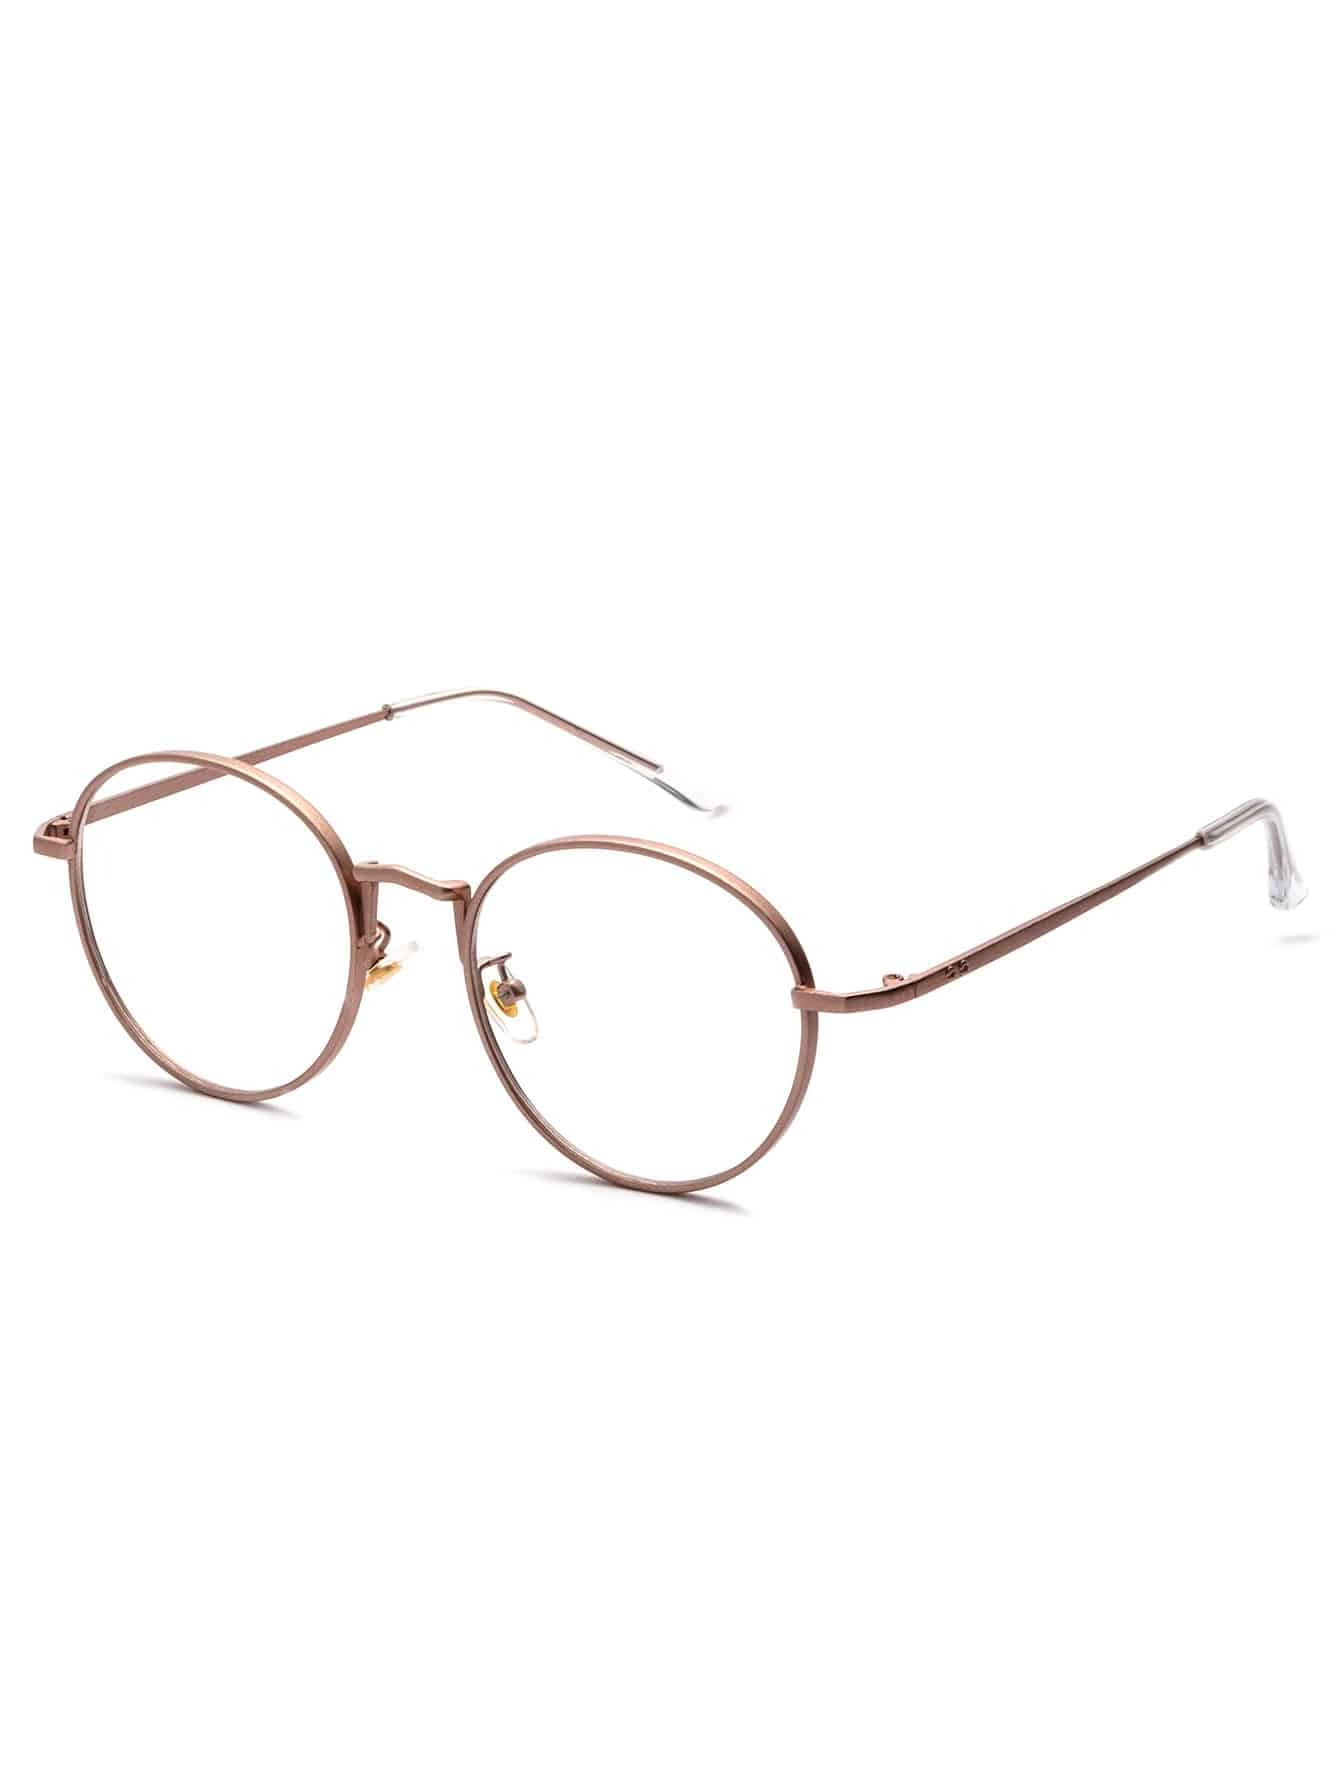 rose gold delicate frame clear lens glasses